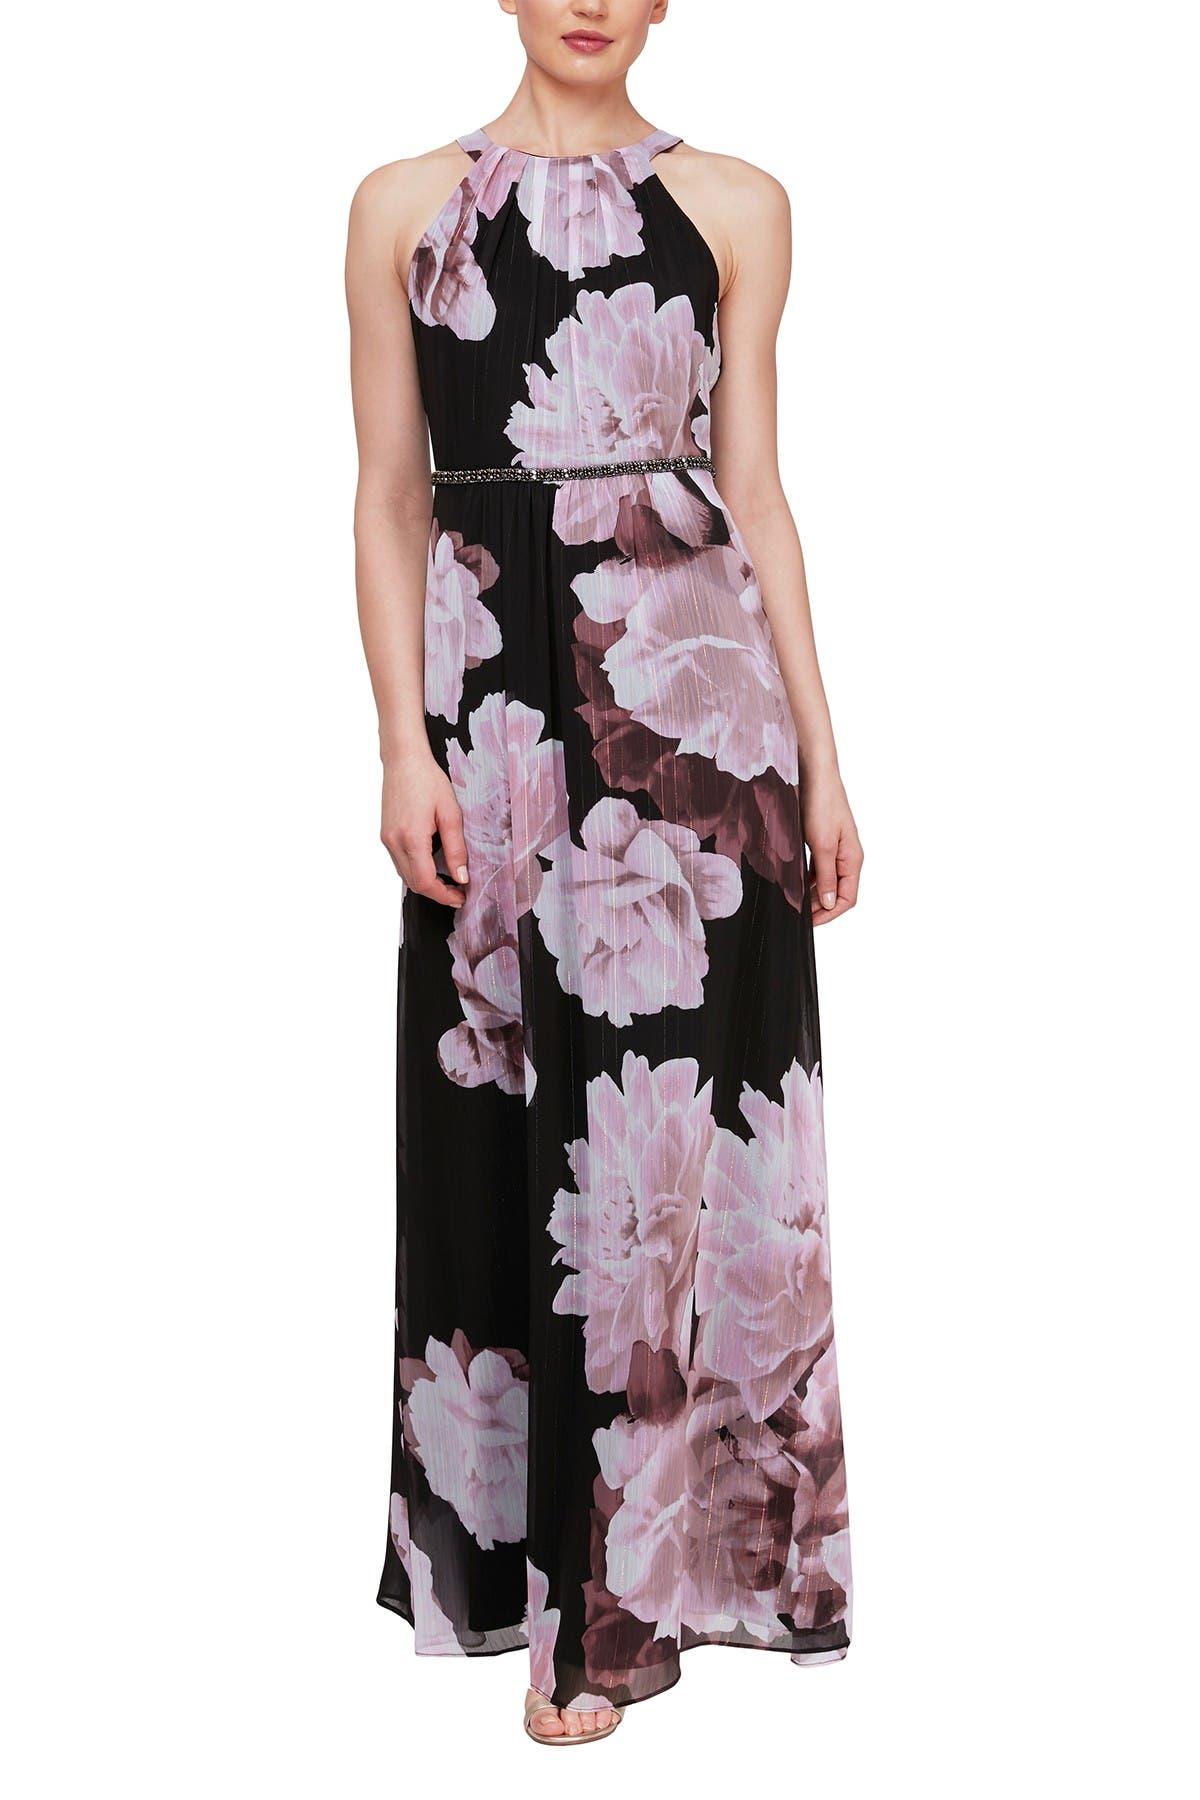 Image of SLNY Floral Embellished Waist Maxi Dress